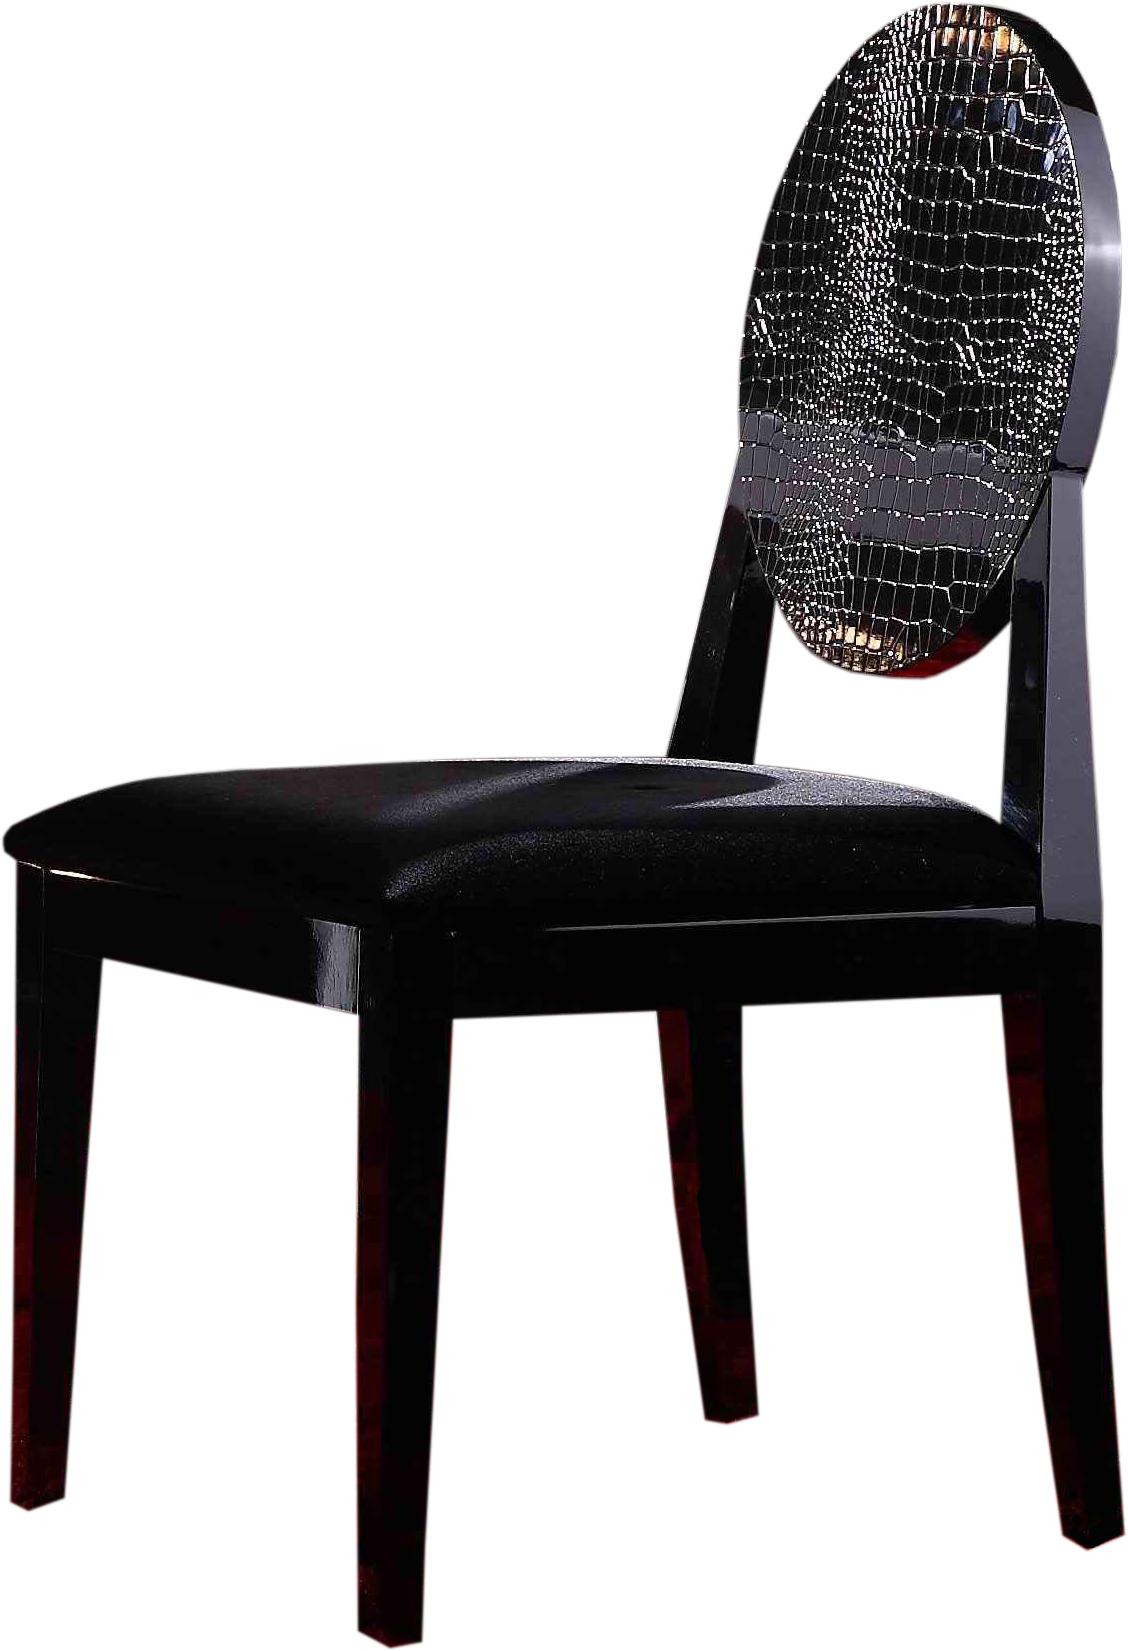 AA018 Modern Black Crocodile Texture Dining Chair